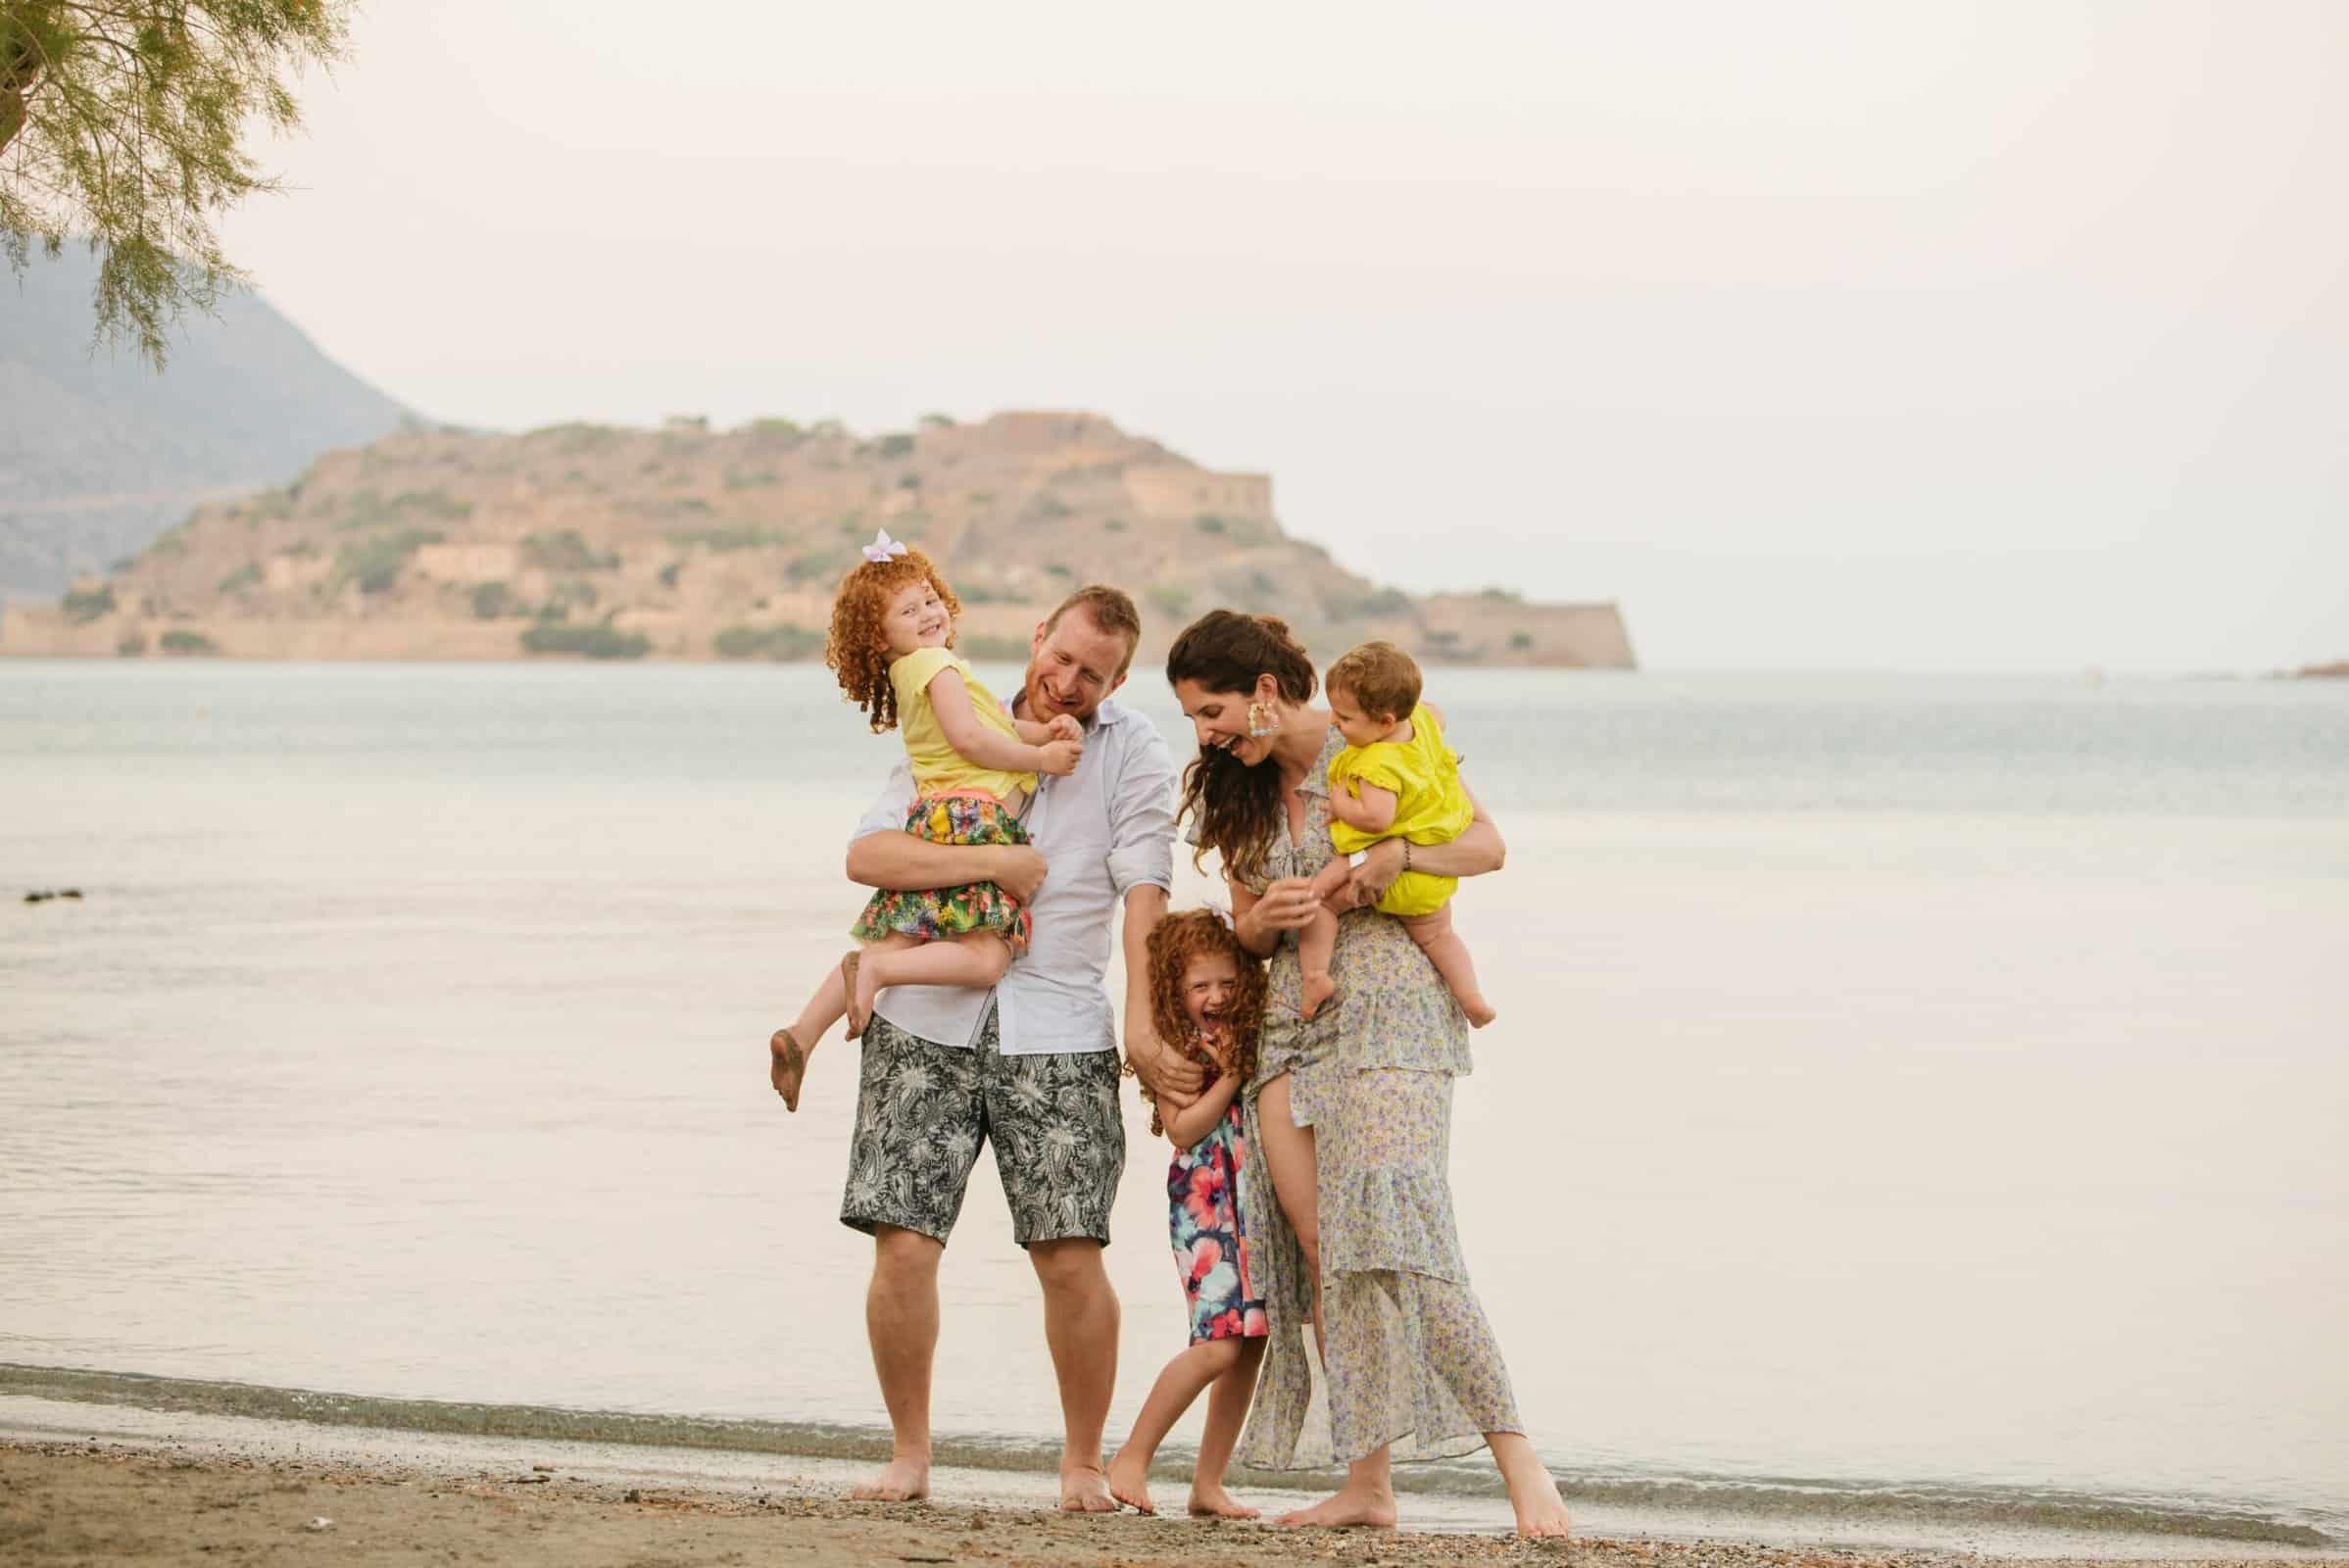 Meet the sitter: a Q&A with Natasha Stoller